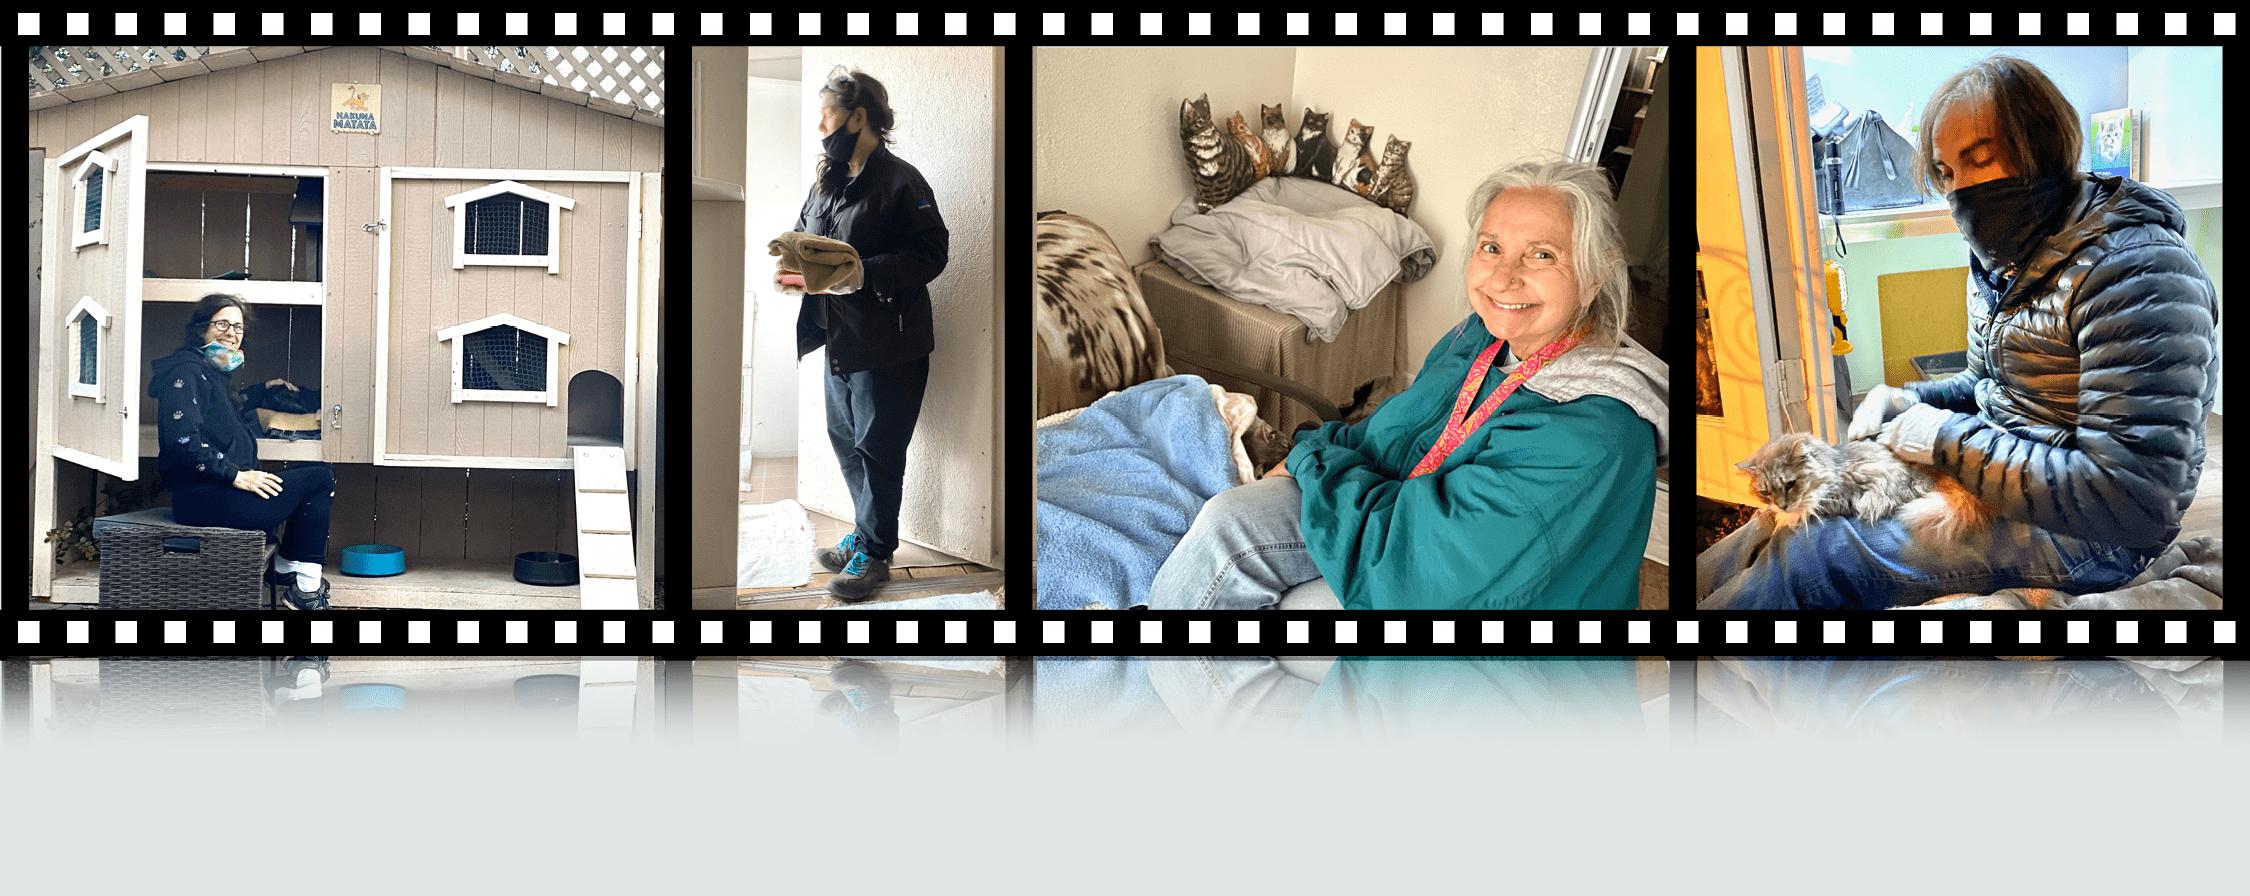 Filmstrip - Shanti's House Action Shots 3